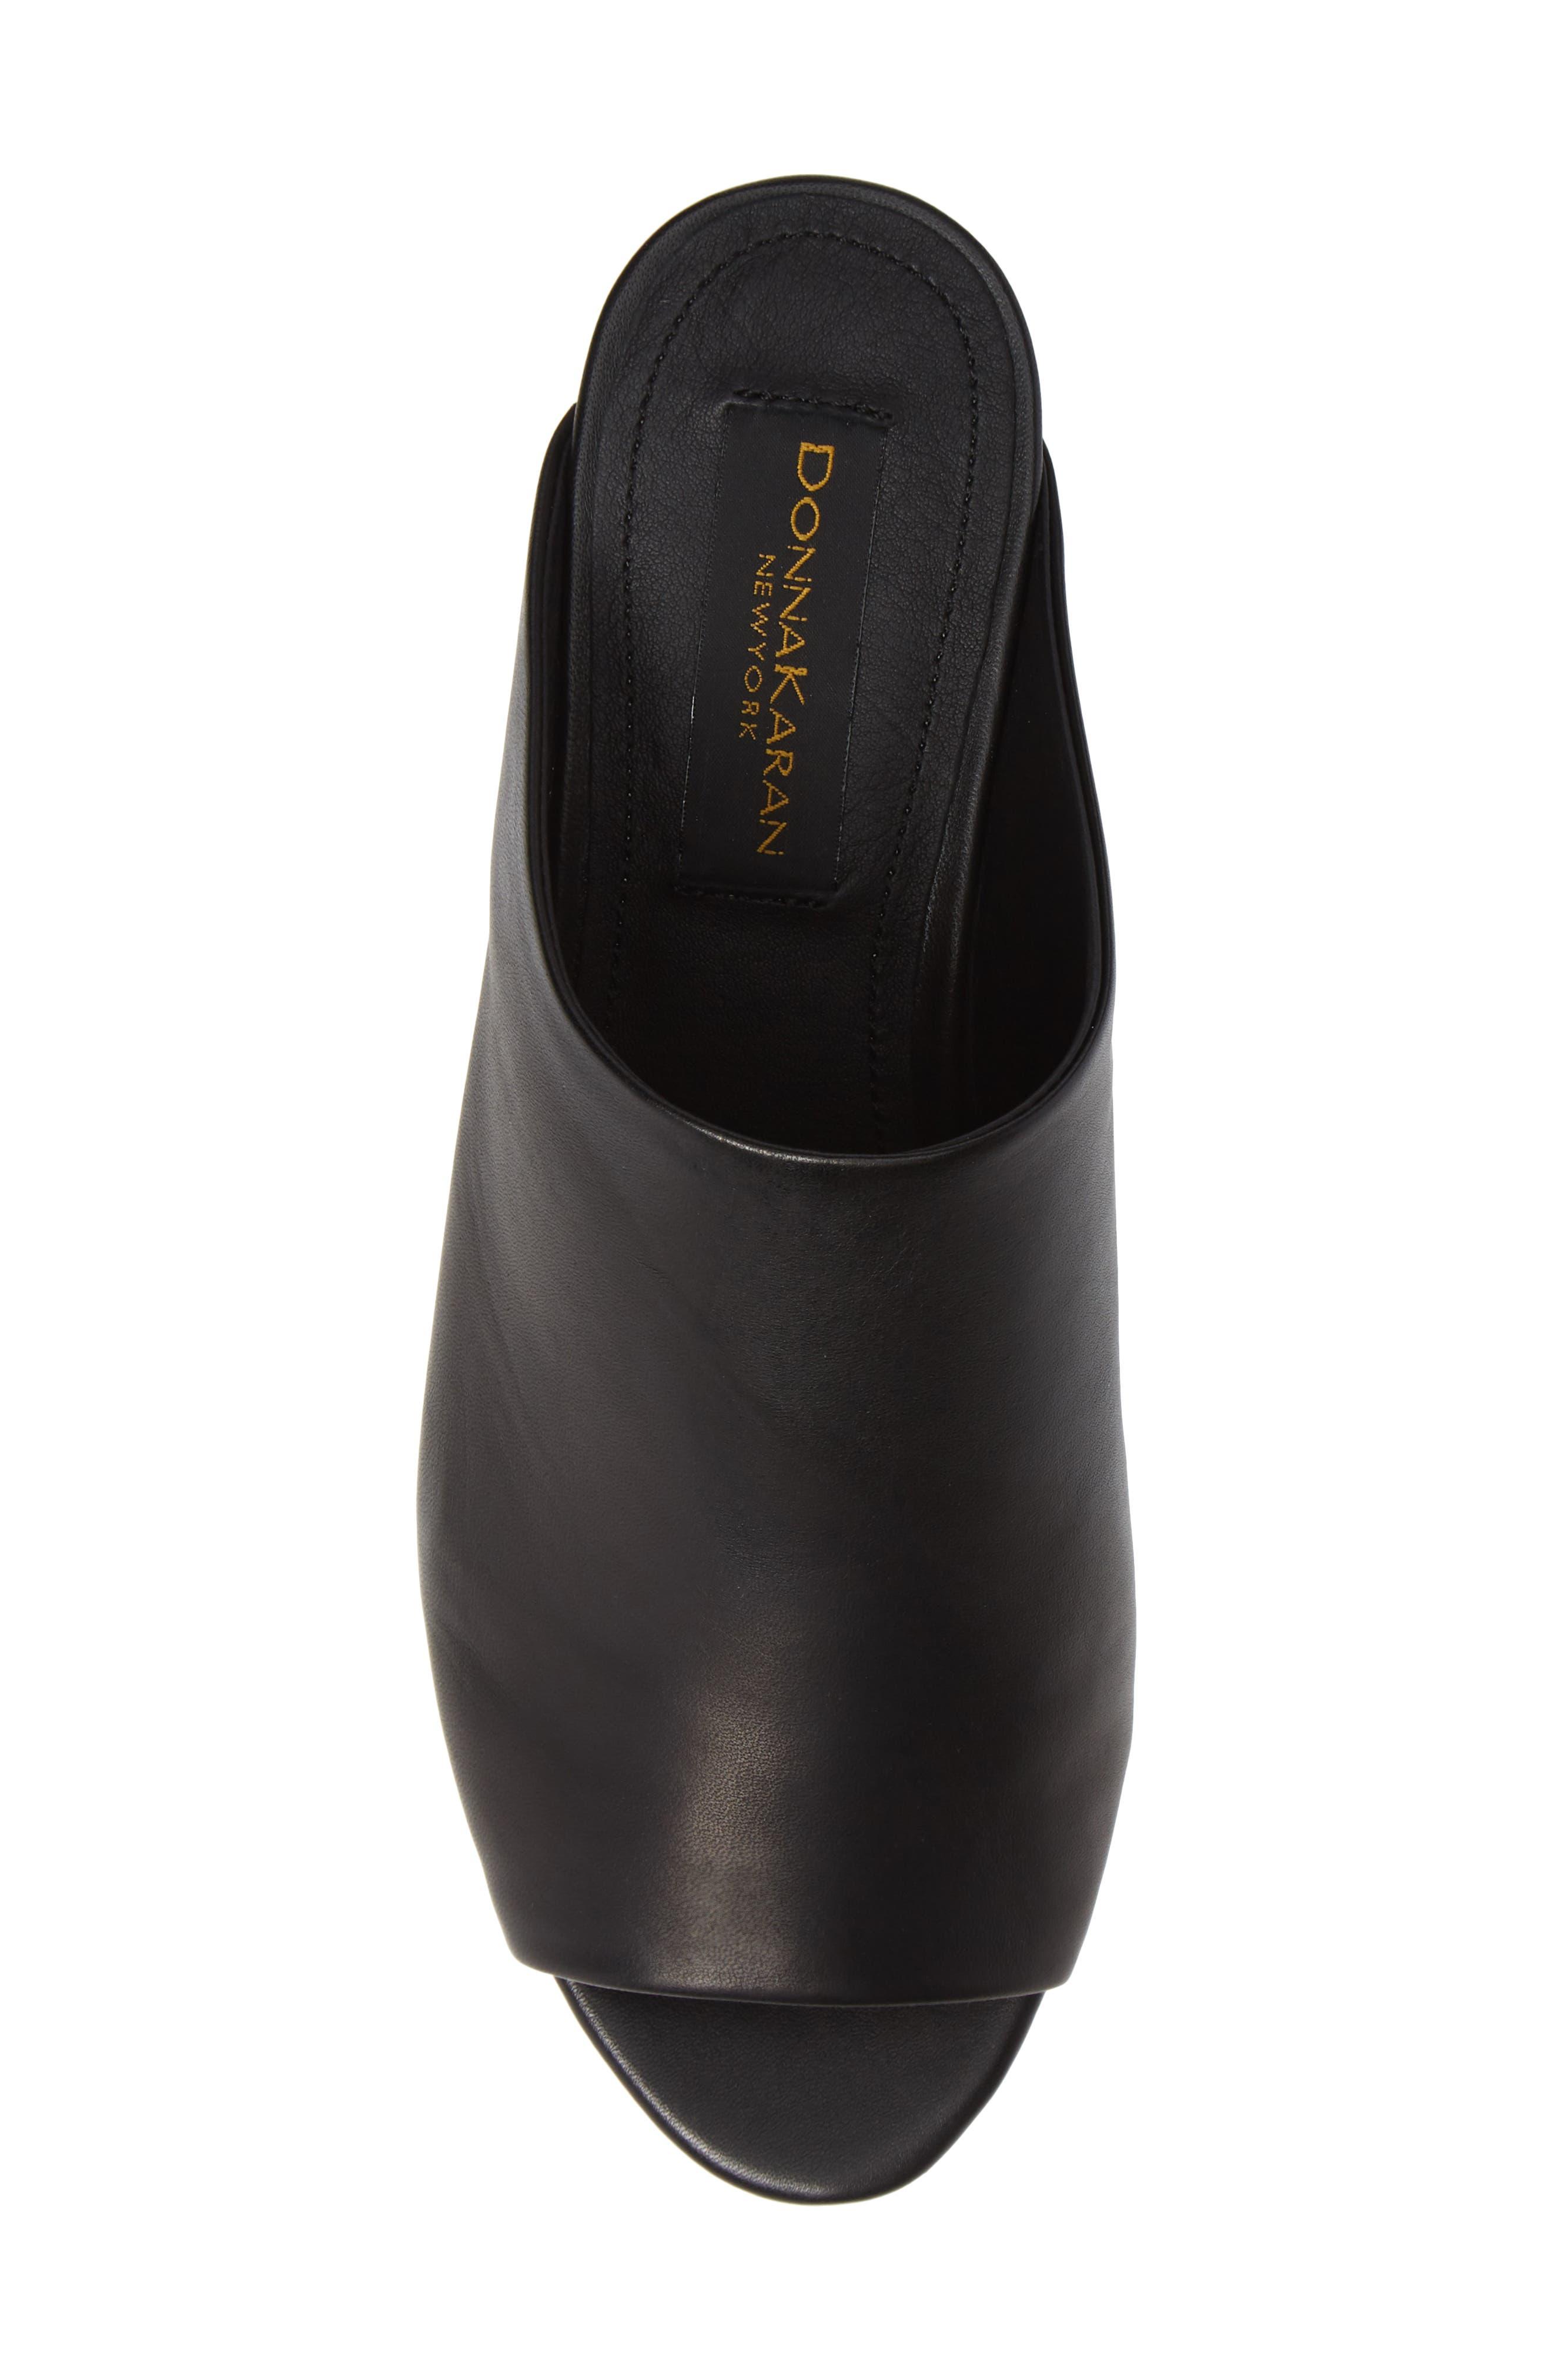 Donna Karan Reisley Wedge Slide Sandal,                             Alternate thumbnail 5, color,                             BLACK LEATHER